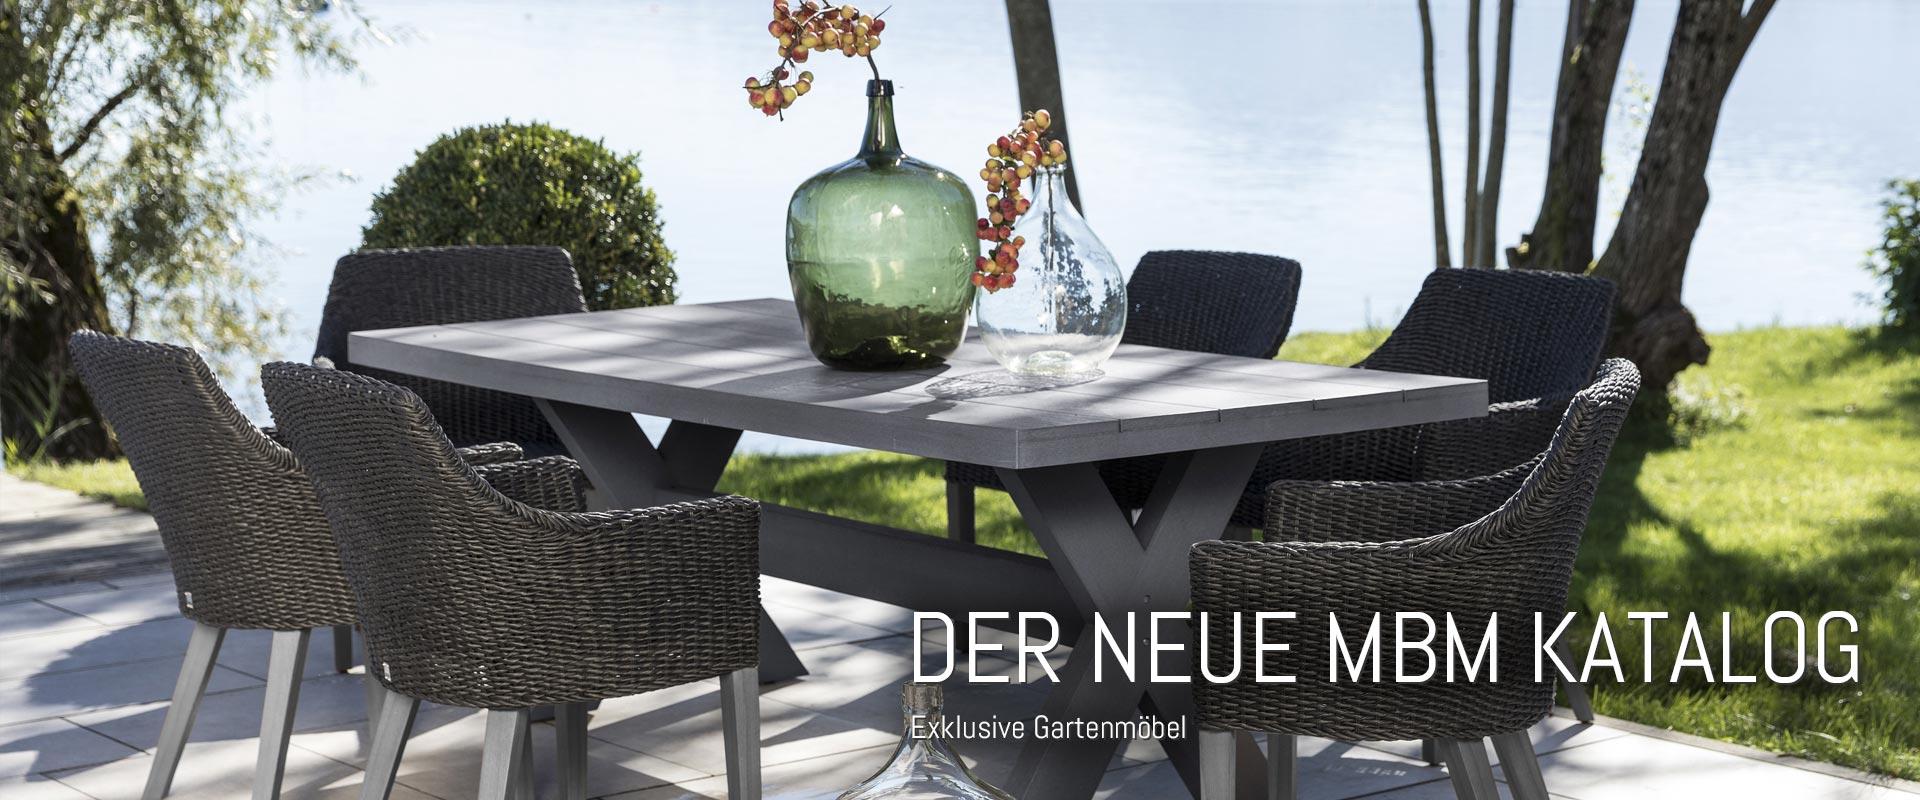 Mbm Hochwertige Gartenmöbel Resysta Outdoor Möbel Mbm Münchner